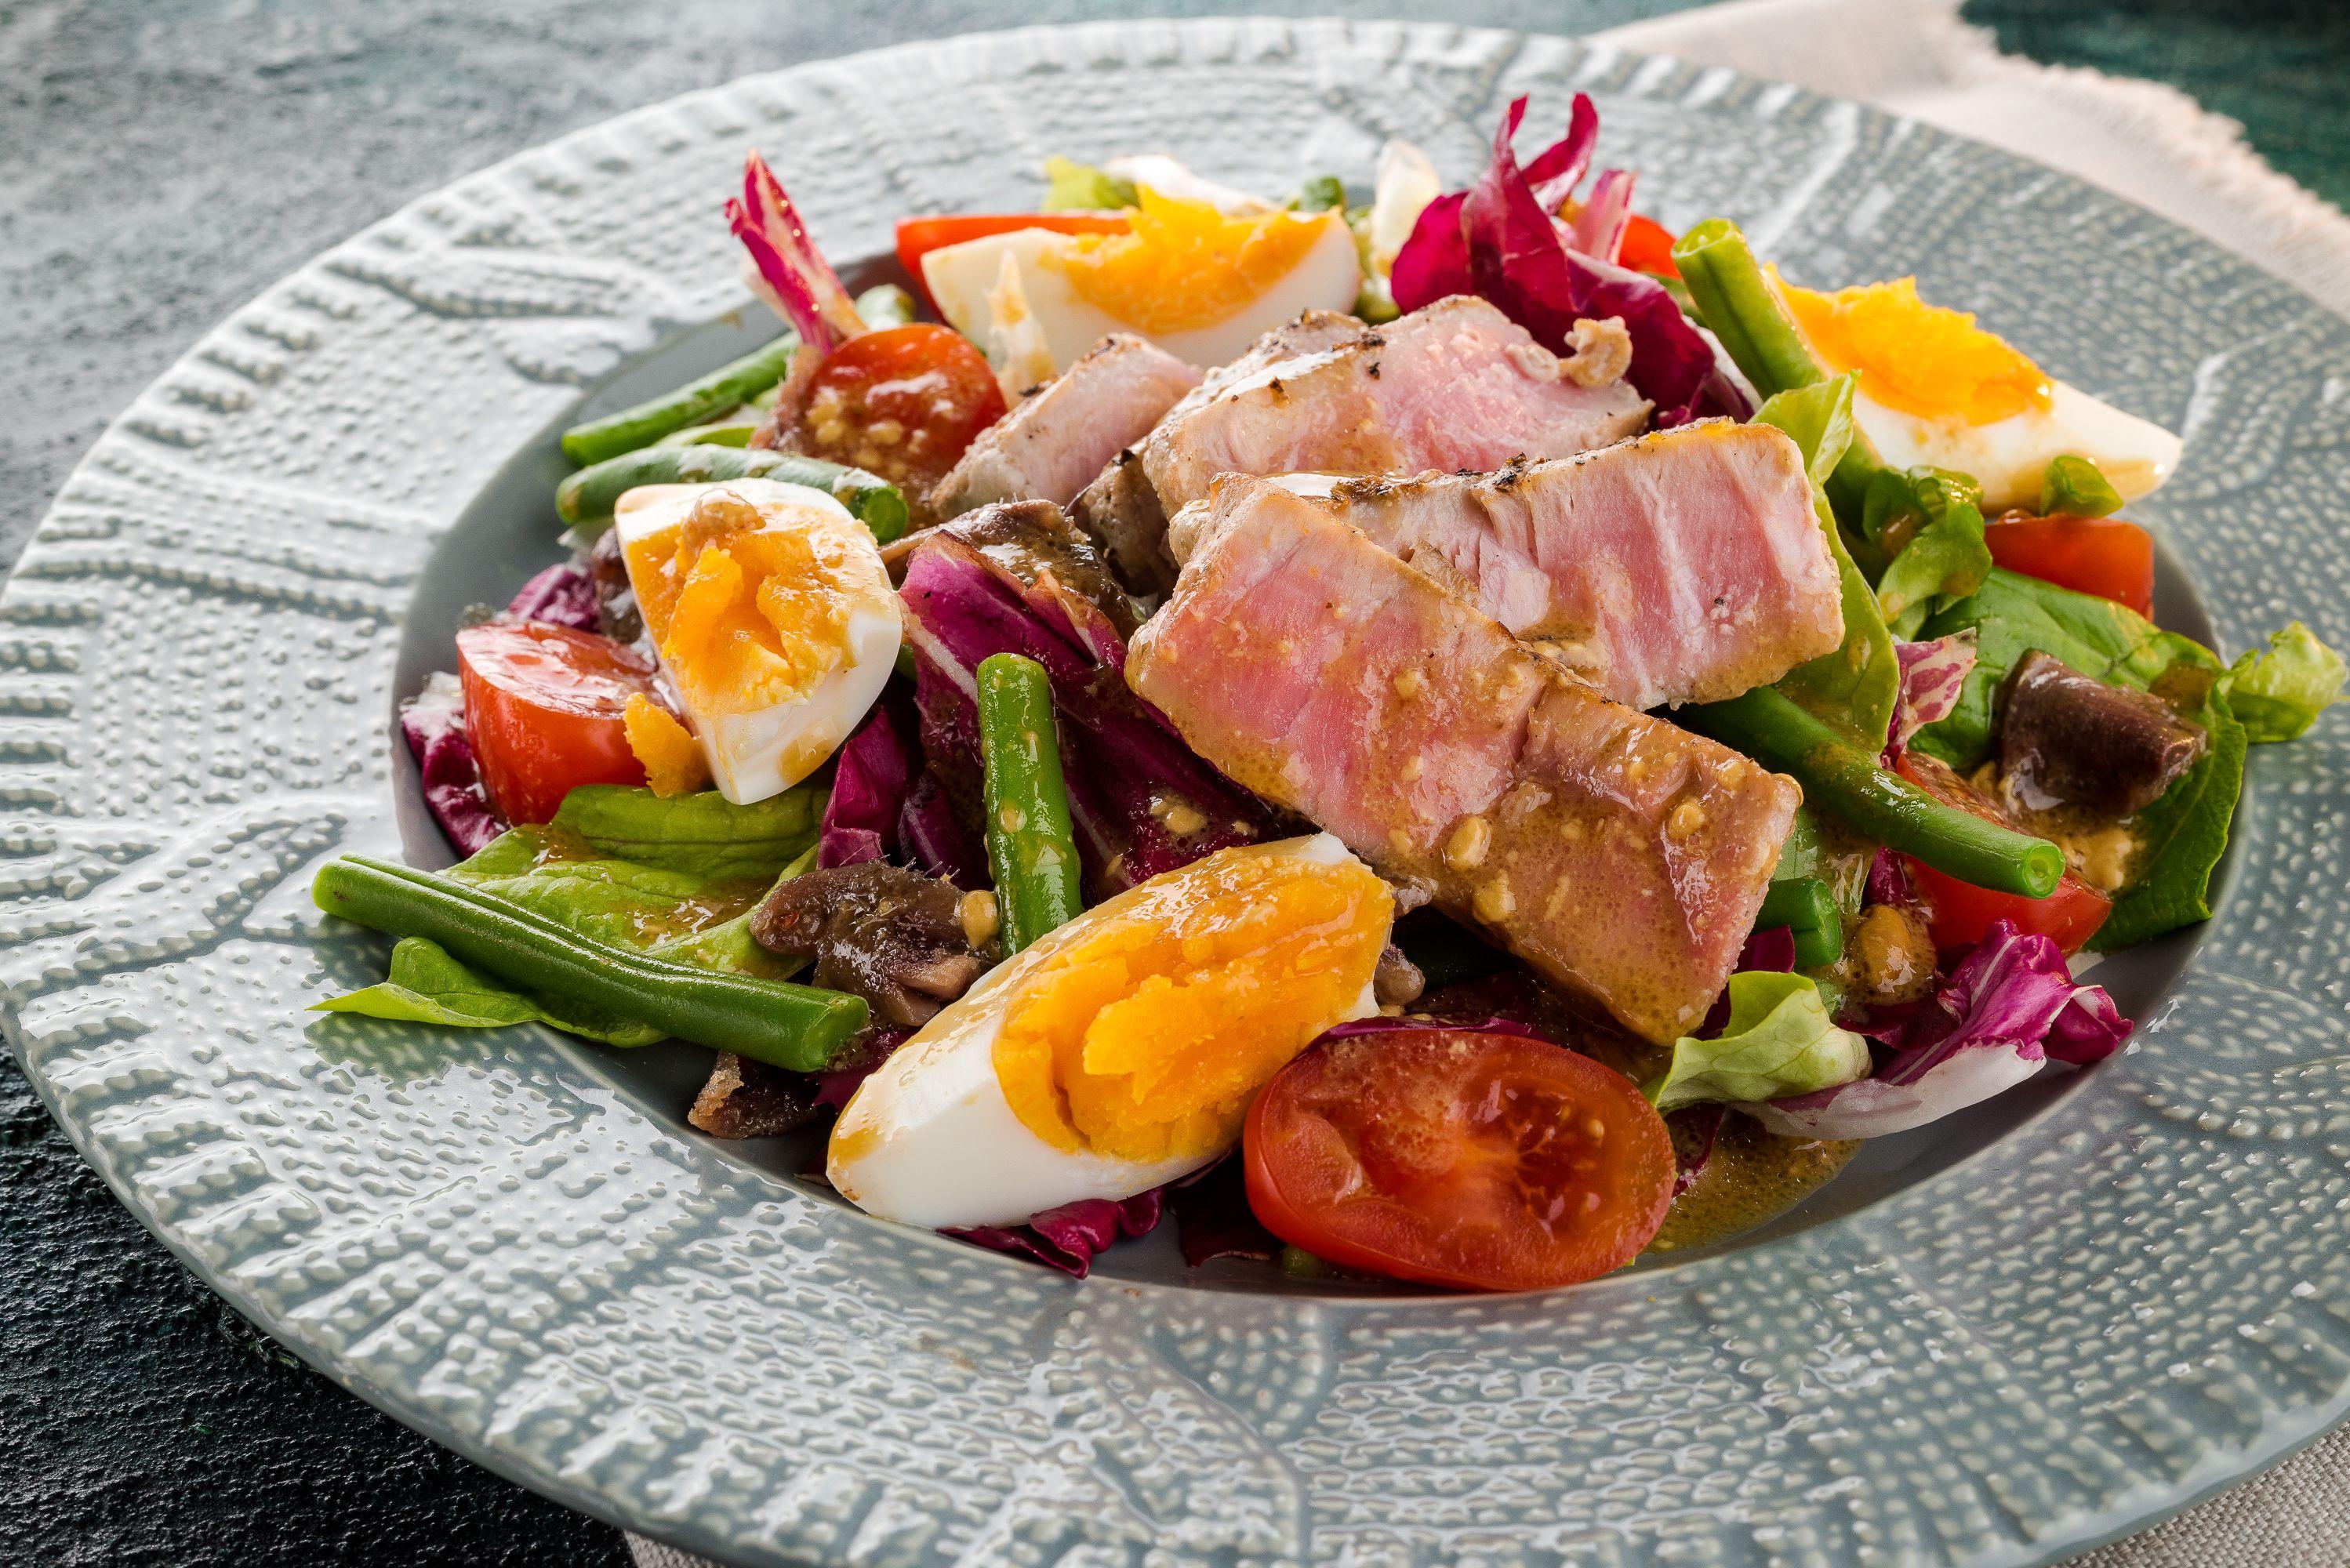 Nicoise salad with grilled tuna